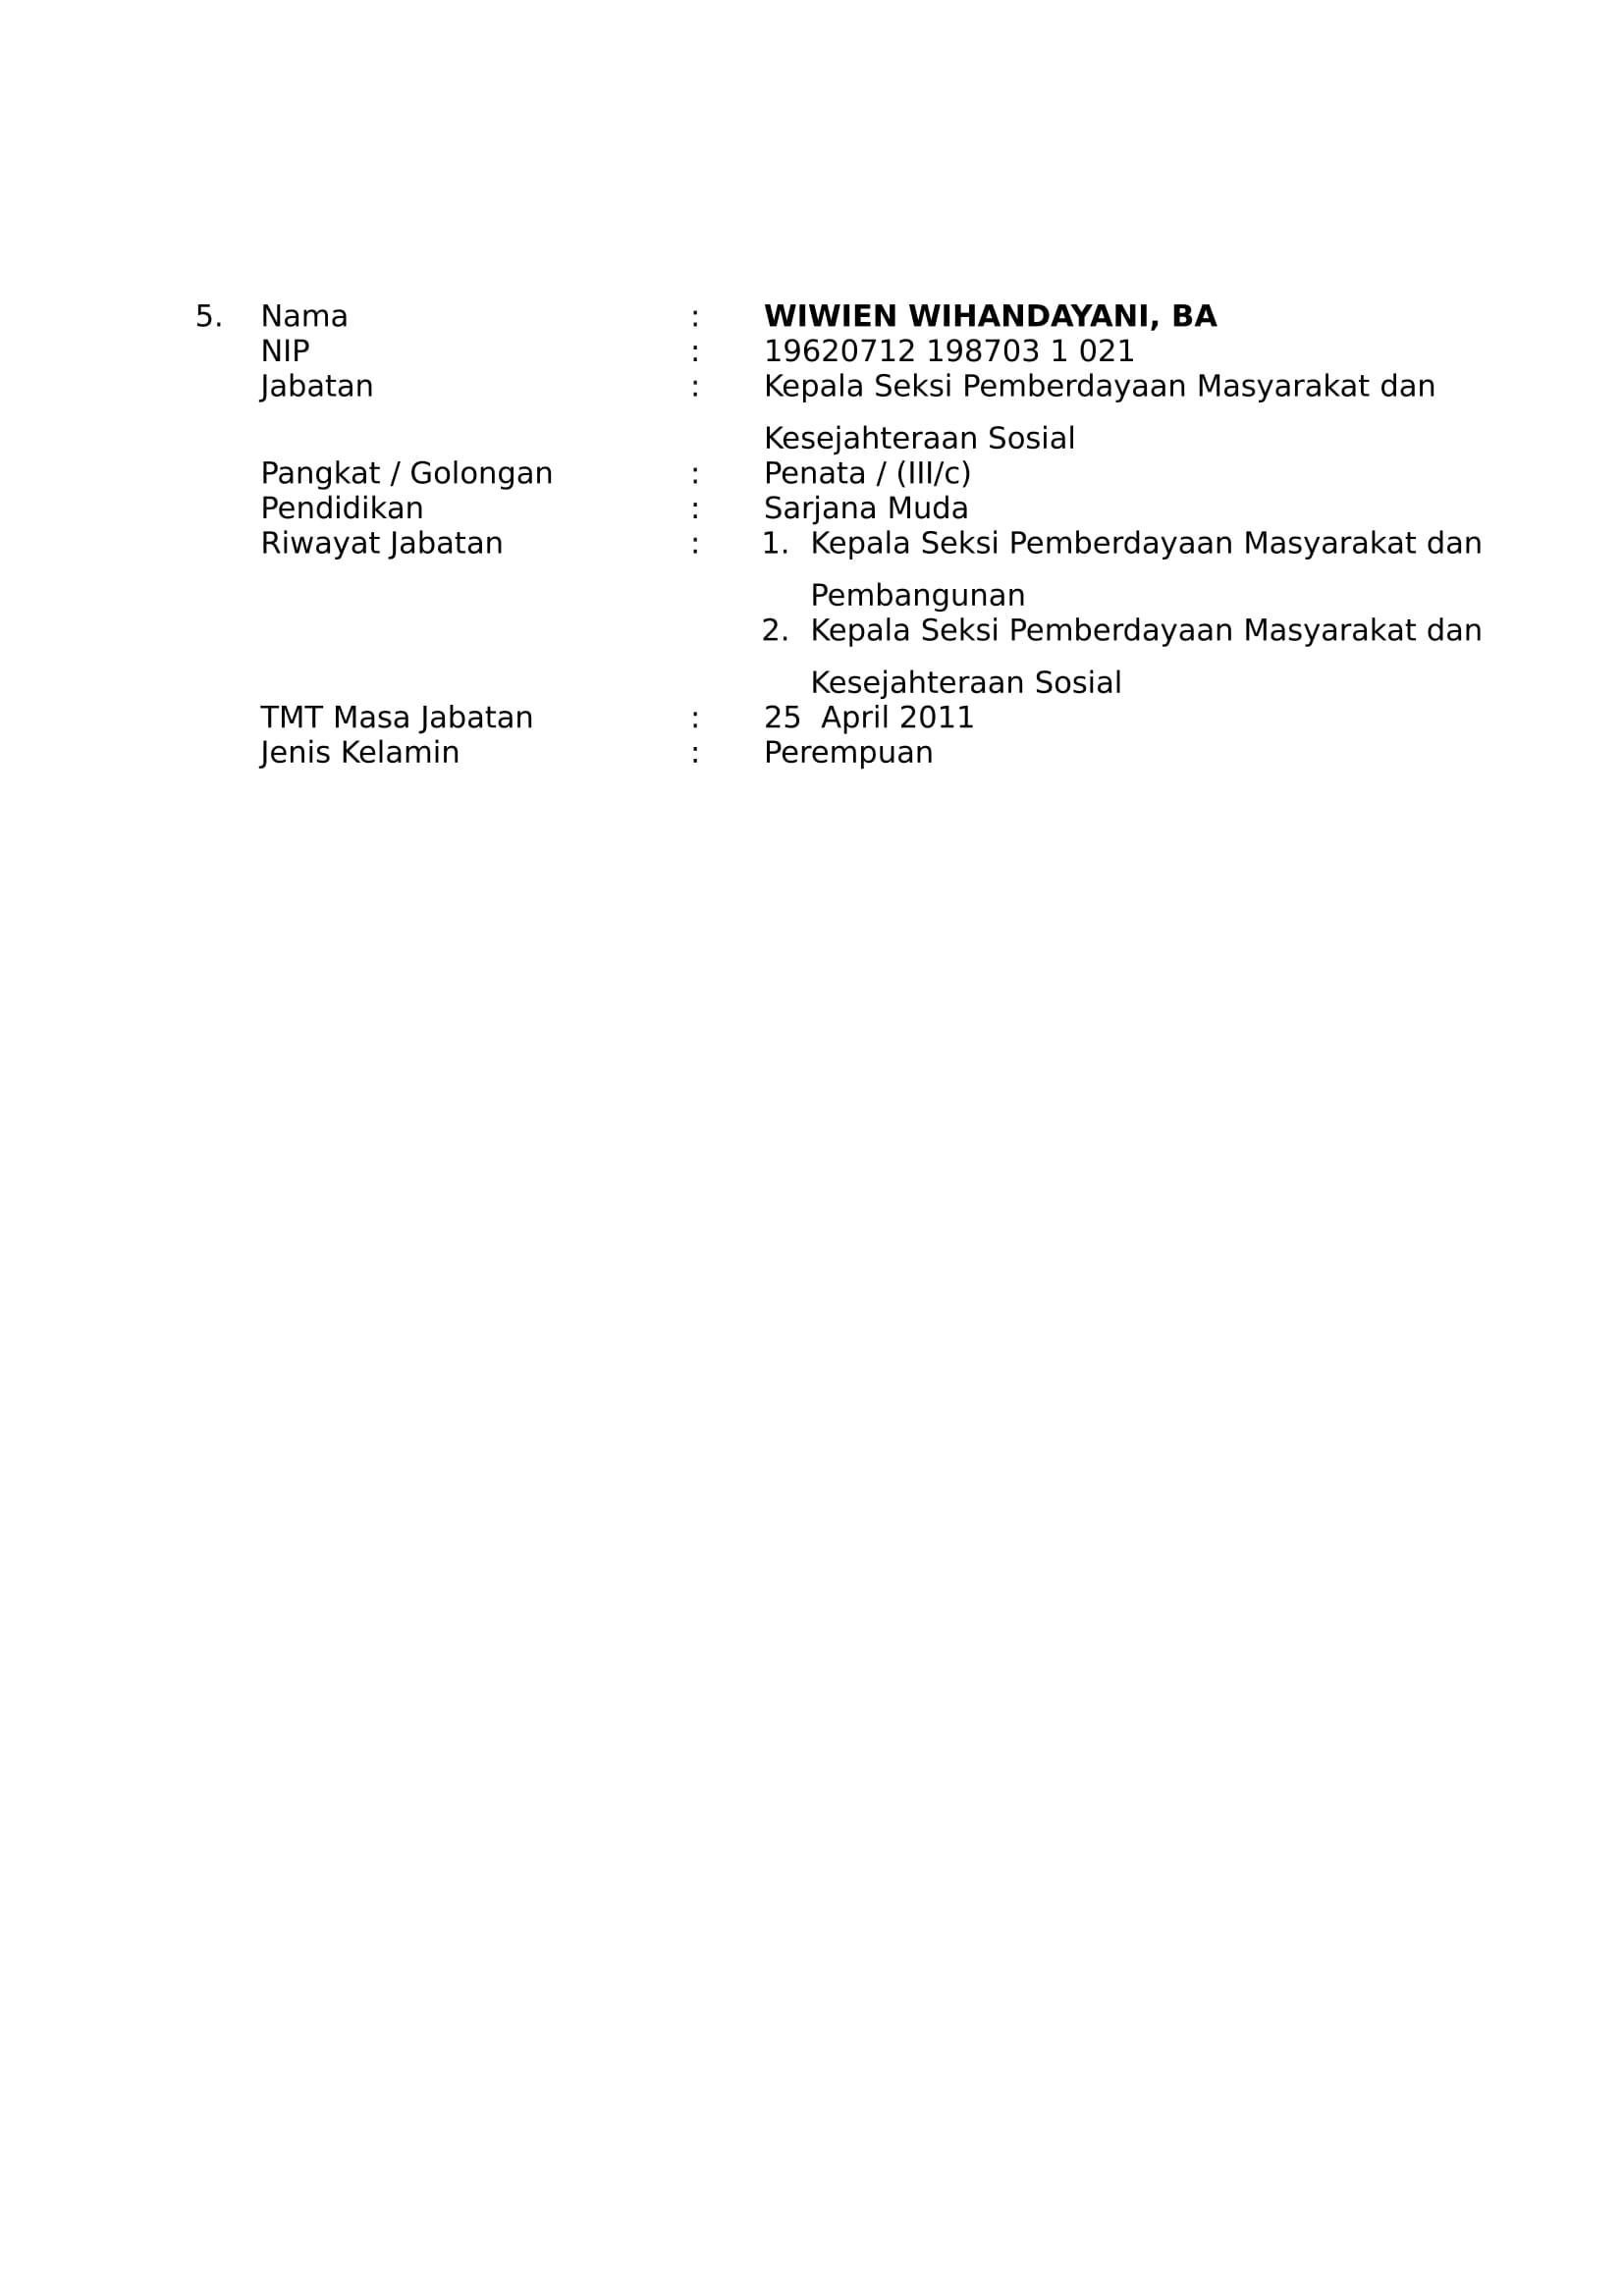 Daftar Nama Pejabat Struktural - Kelurahan Josenan